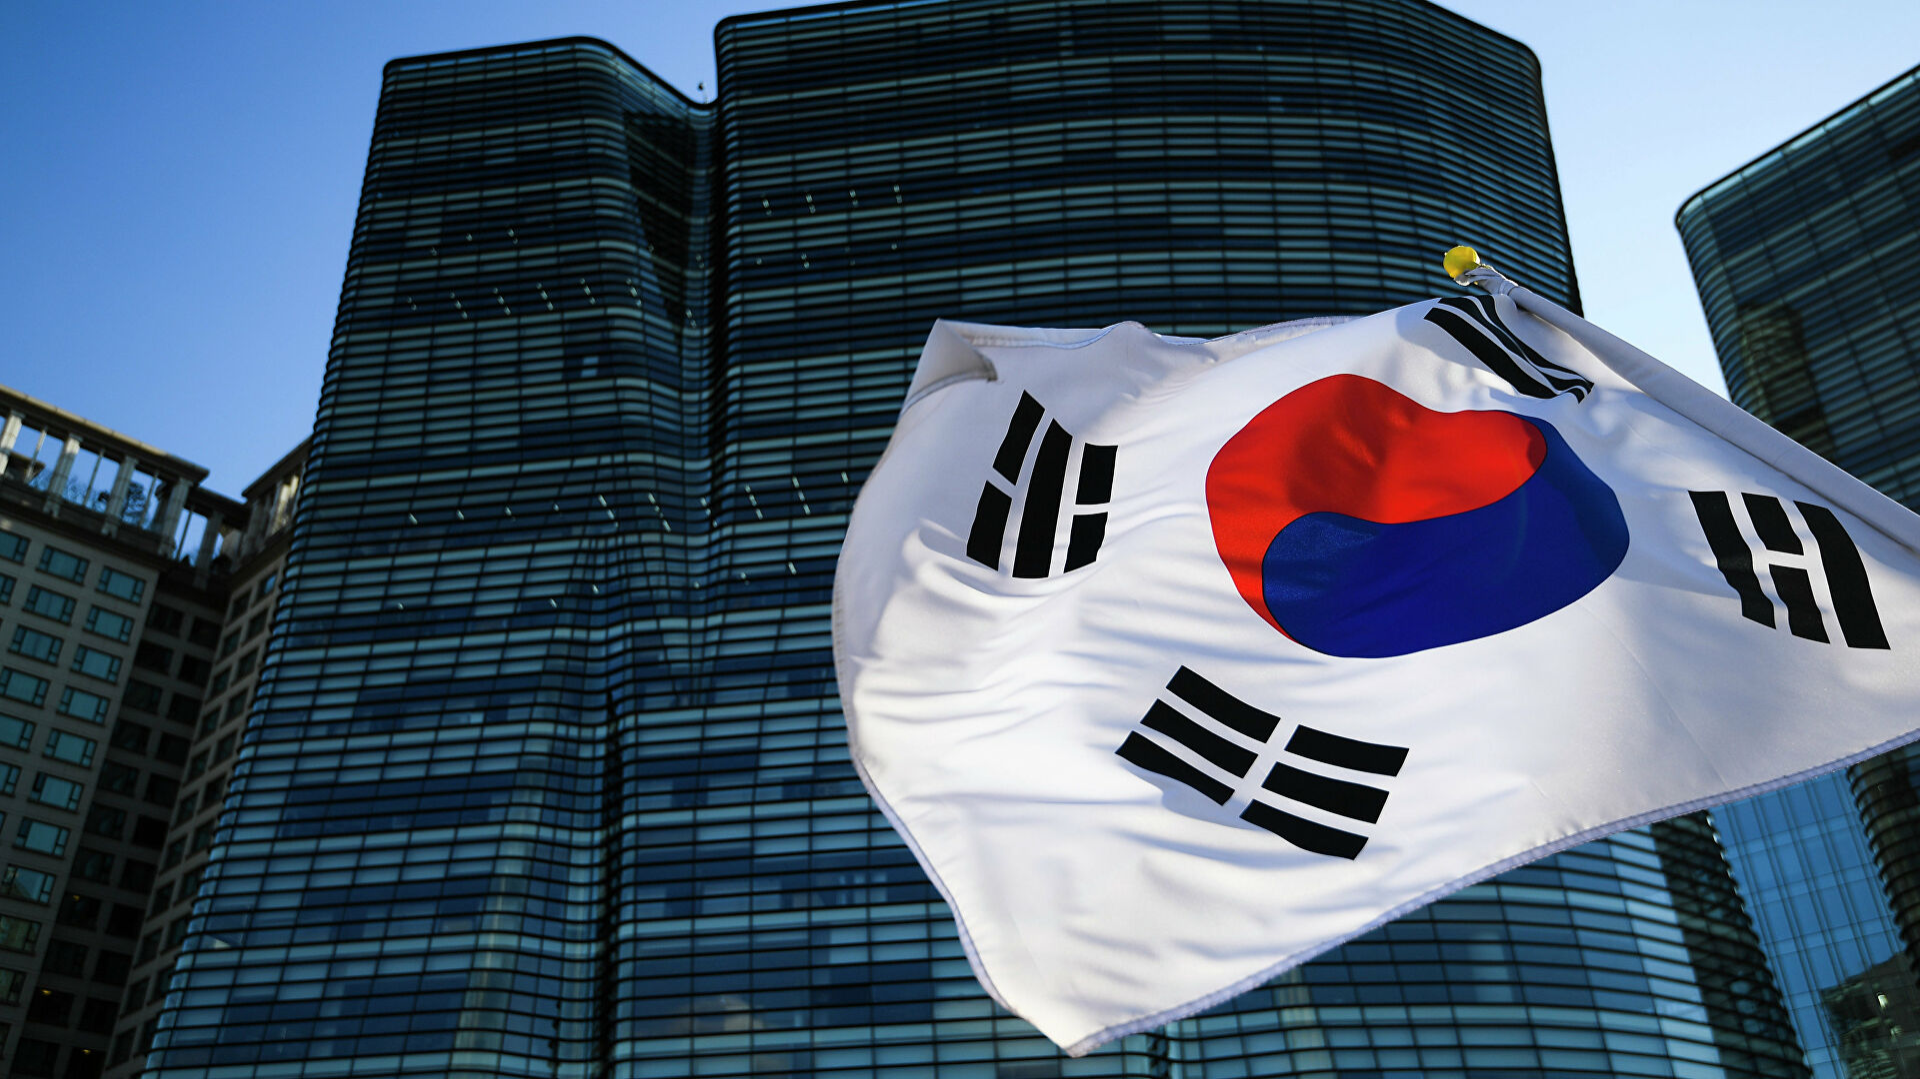 Флаг Республики Корея - РИА Новости, 1920, 28.06.2021